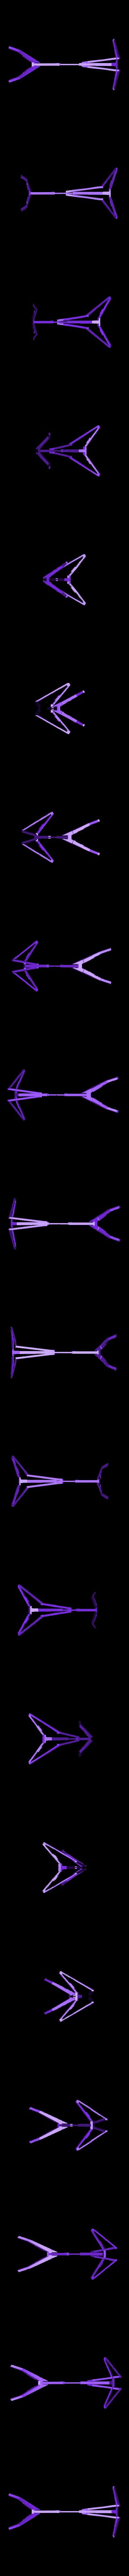 Multi-Color Headphone Stand